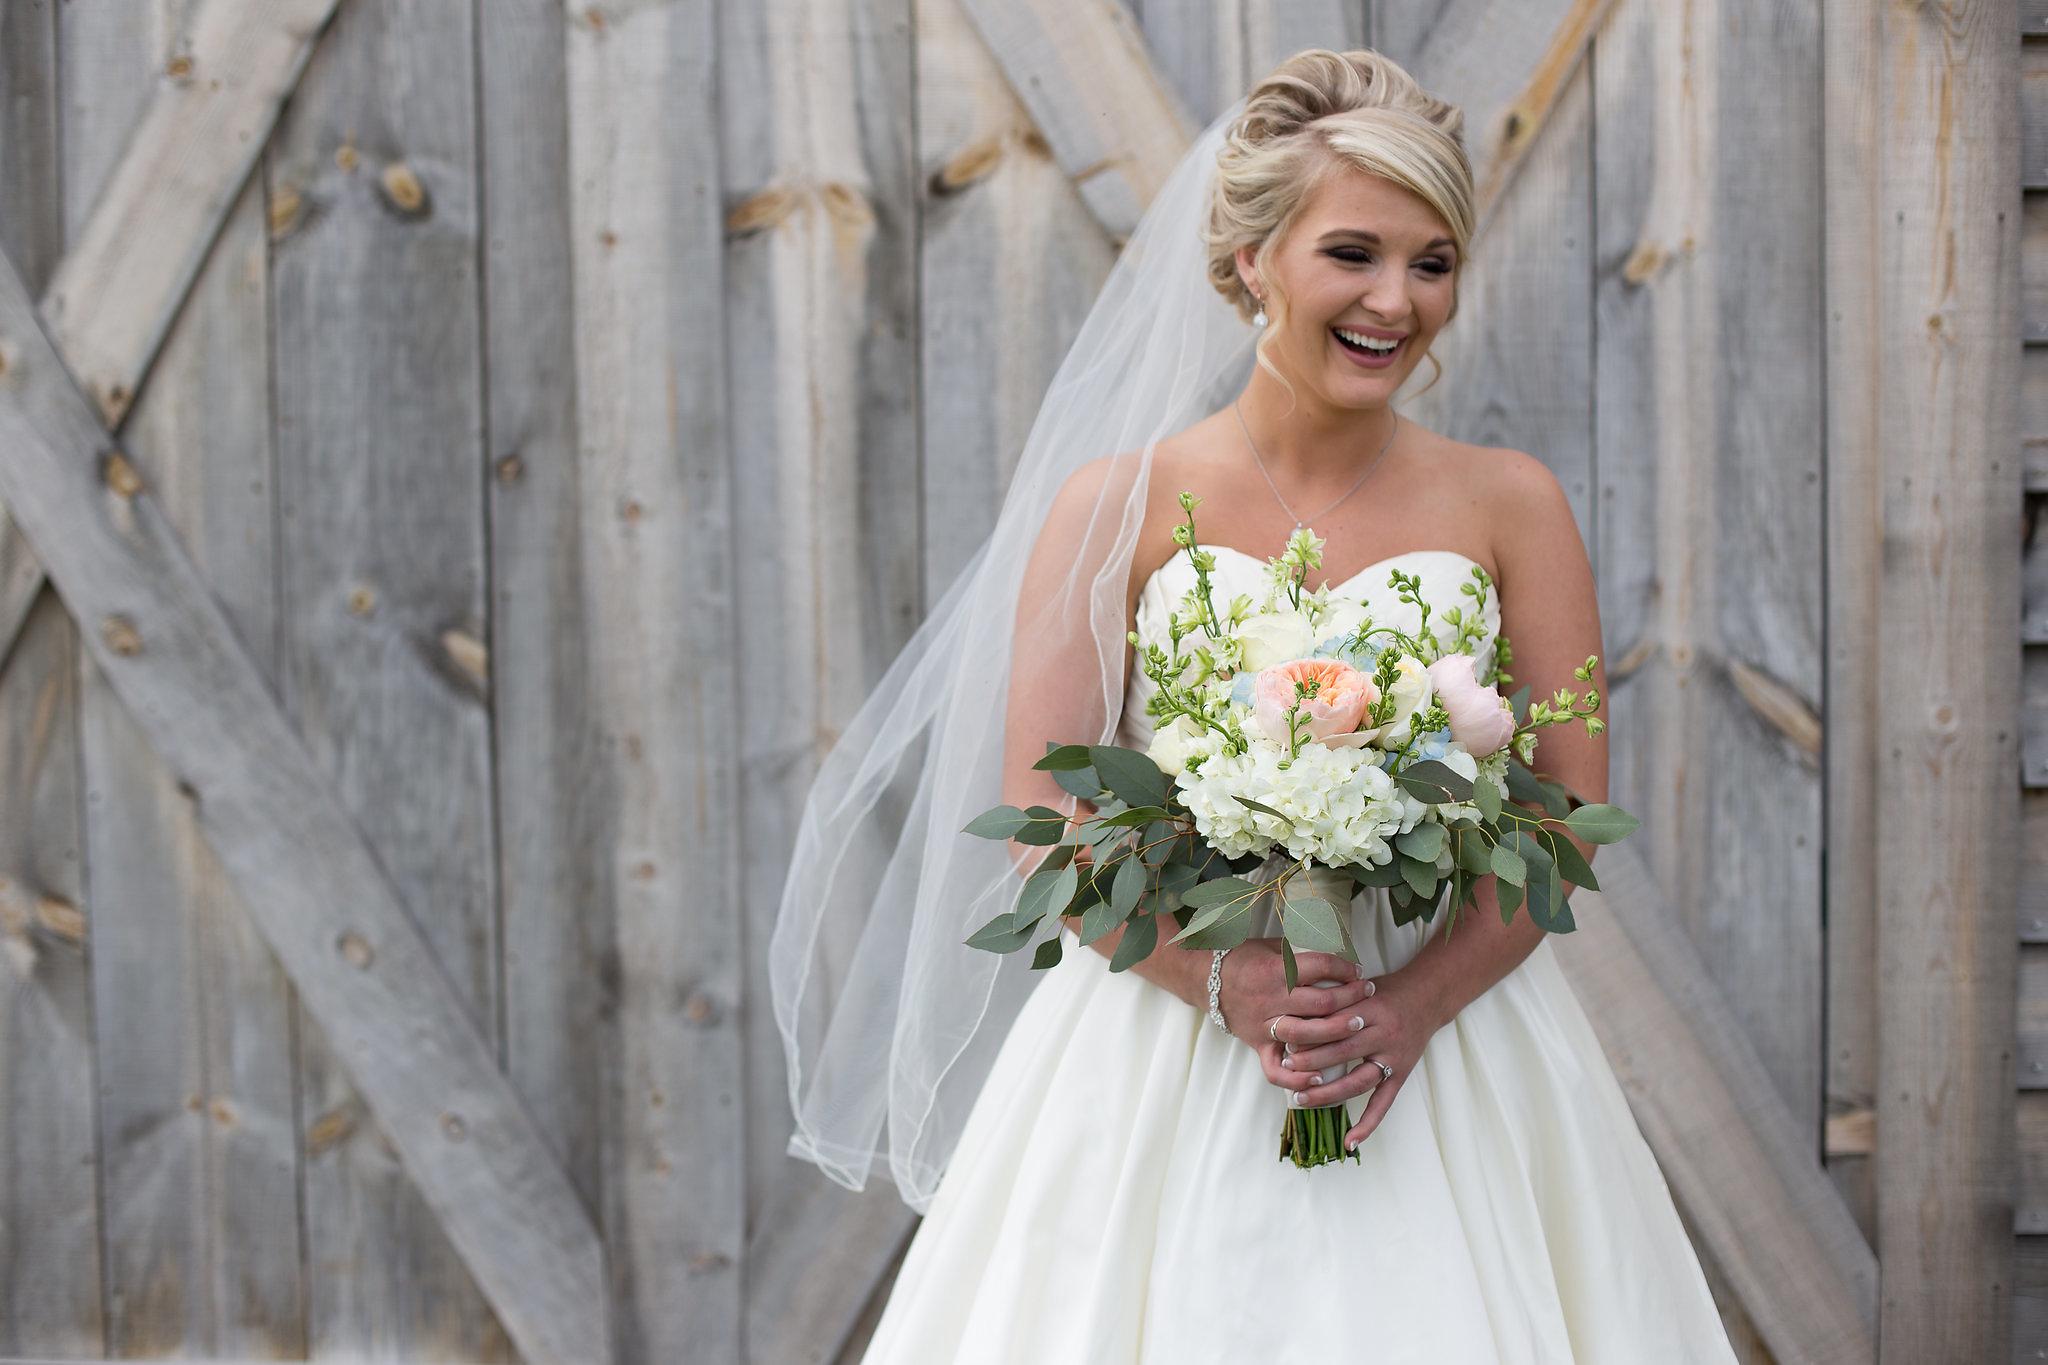 wichita wedding photography 24 jenny myers photography